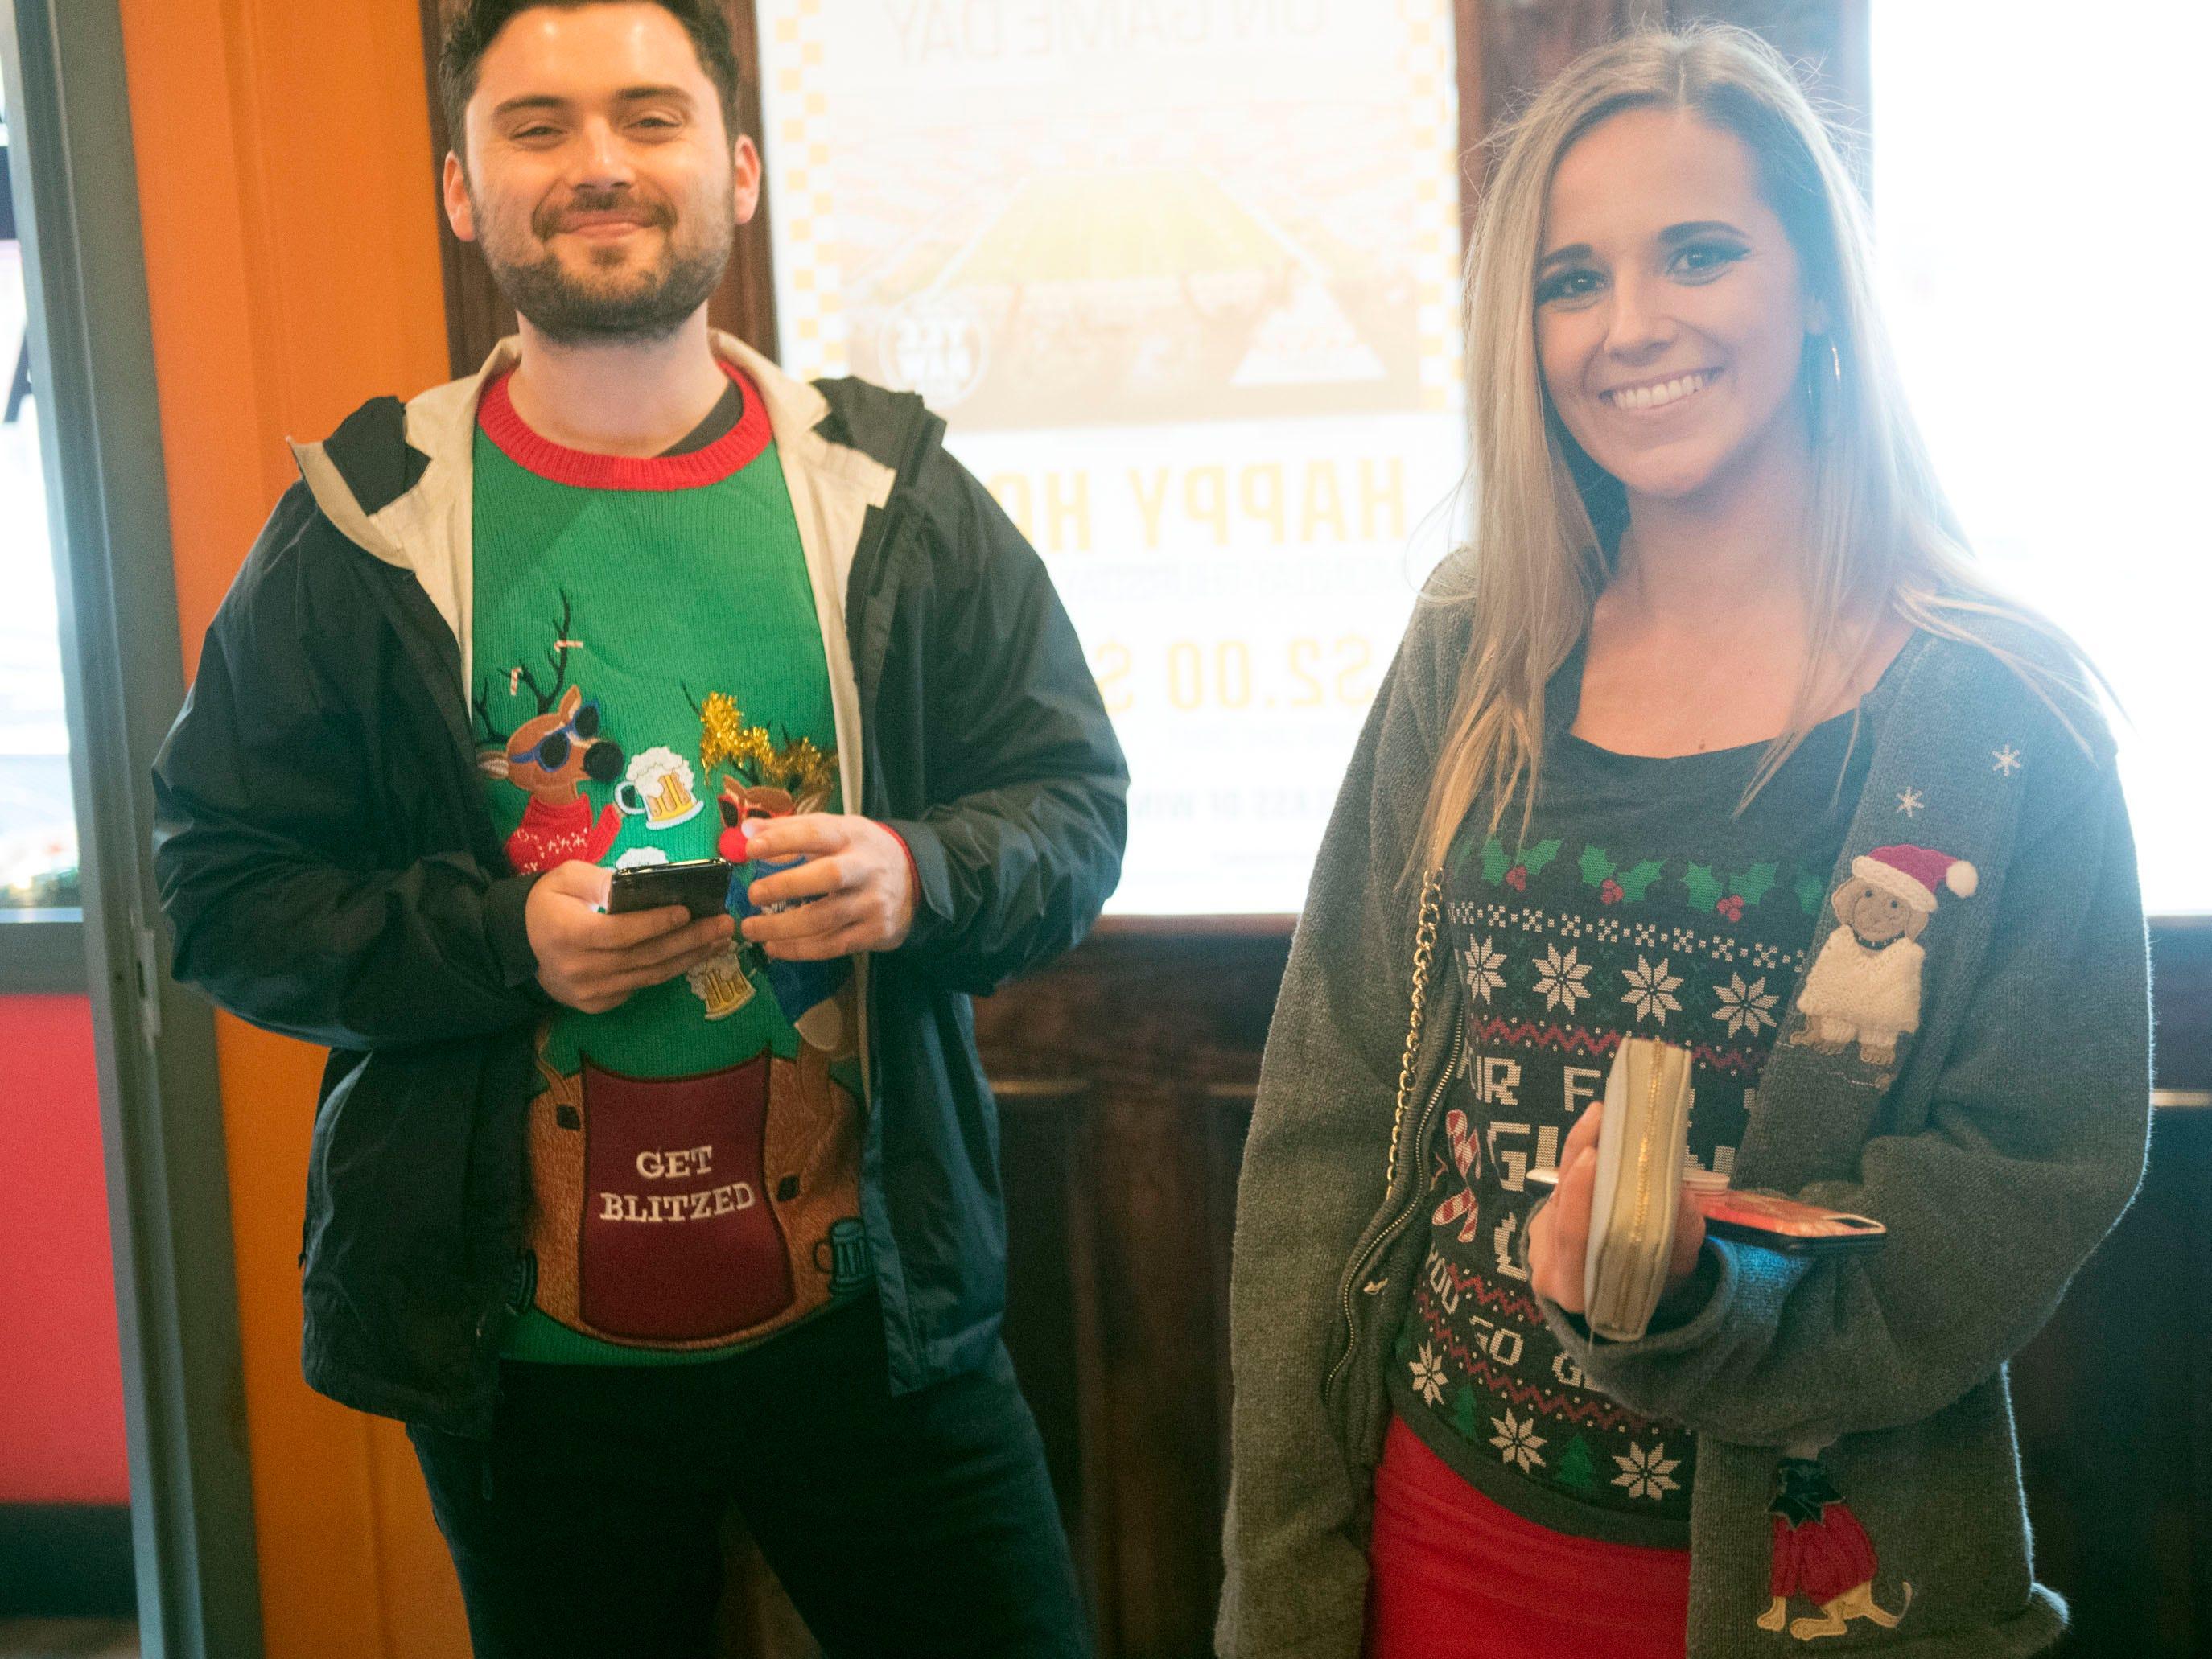 Bar Crawl USA hosts the Ugly Sweater Bar Crawl starting at Skybox Sports Bar & Grill on Saturday, December 8, 2018.